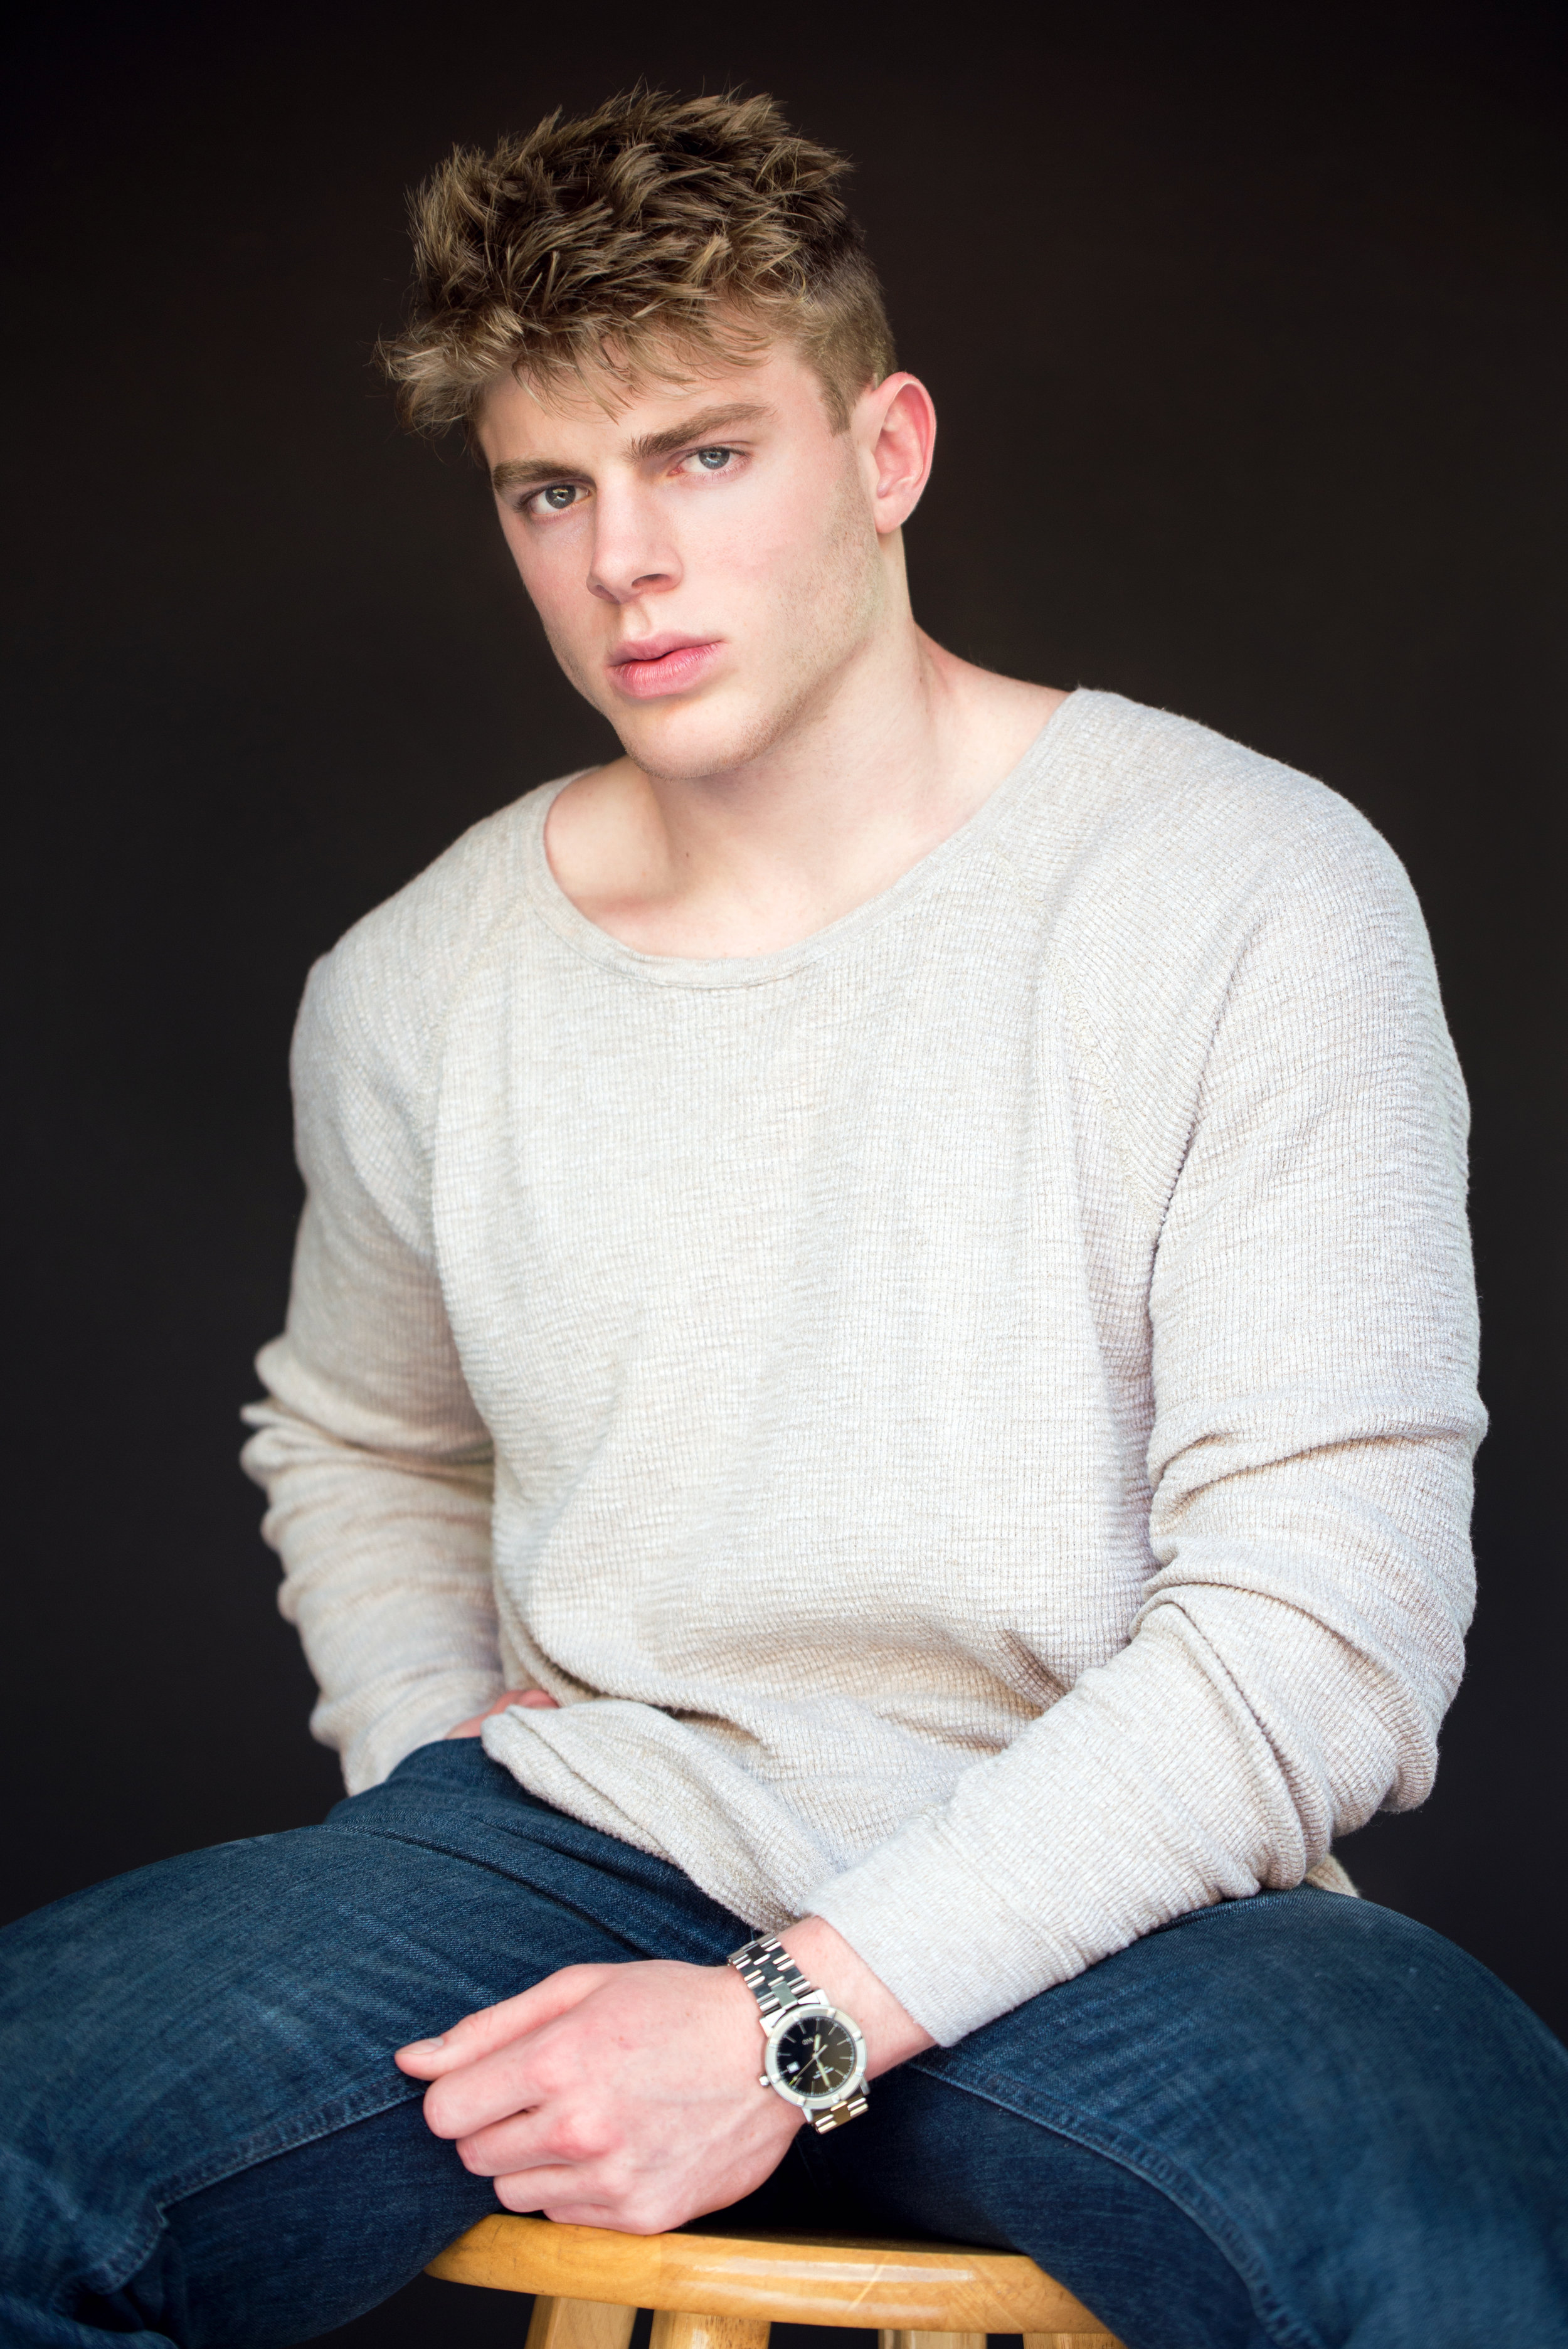 Model: Sawyer Dutton  Agency: Ursula Wiedmann Models